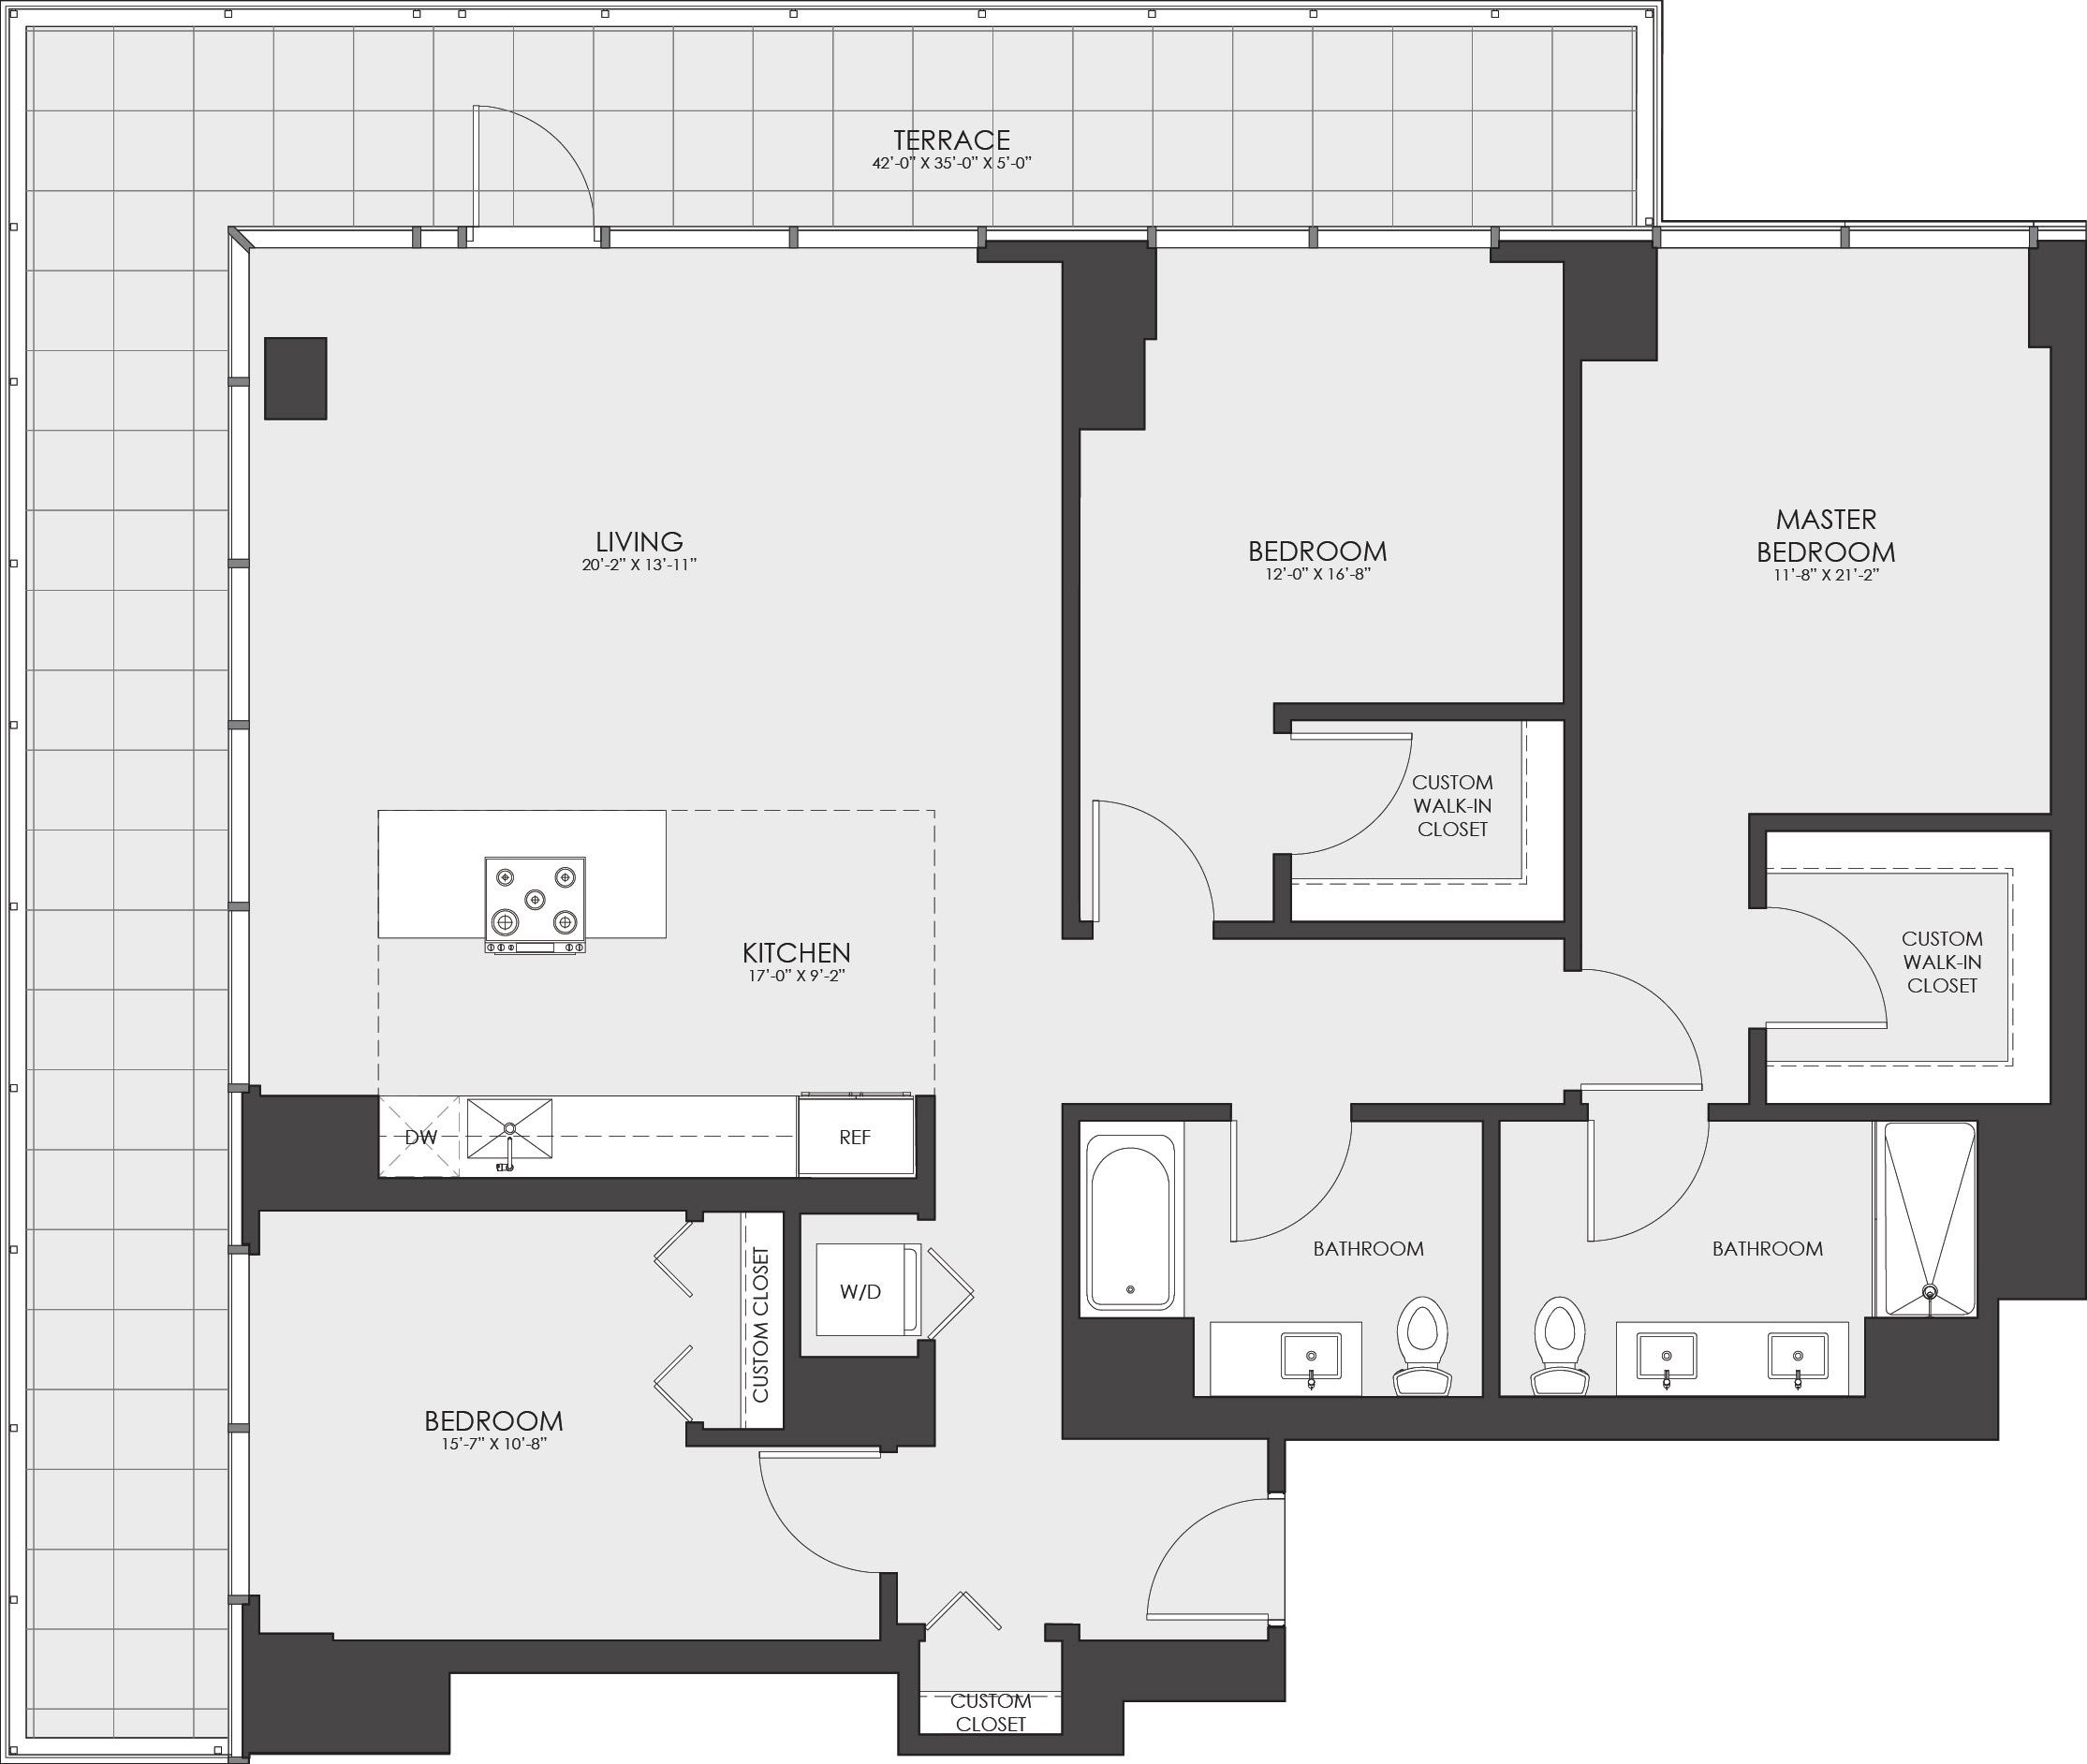 P0614109 796ccp01 221hubbard ph3b4 1511 2 floorplan